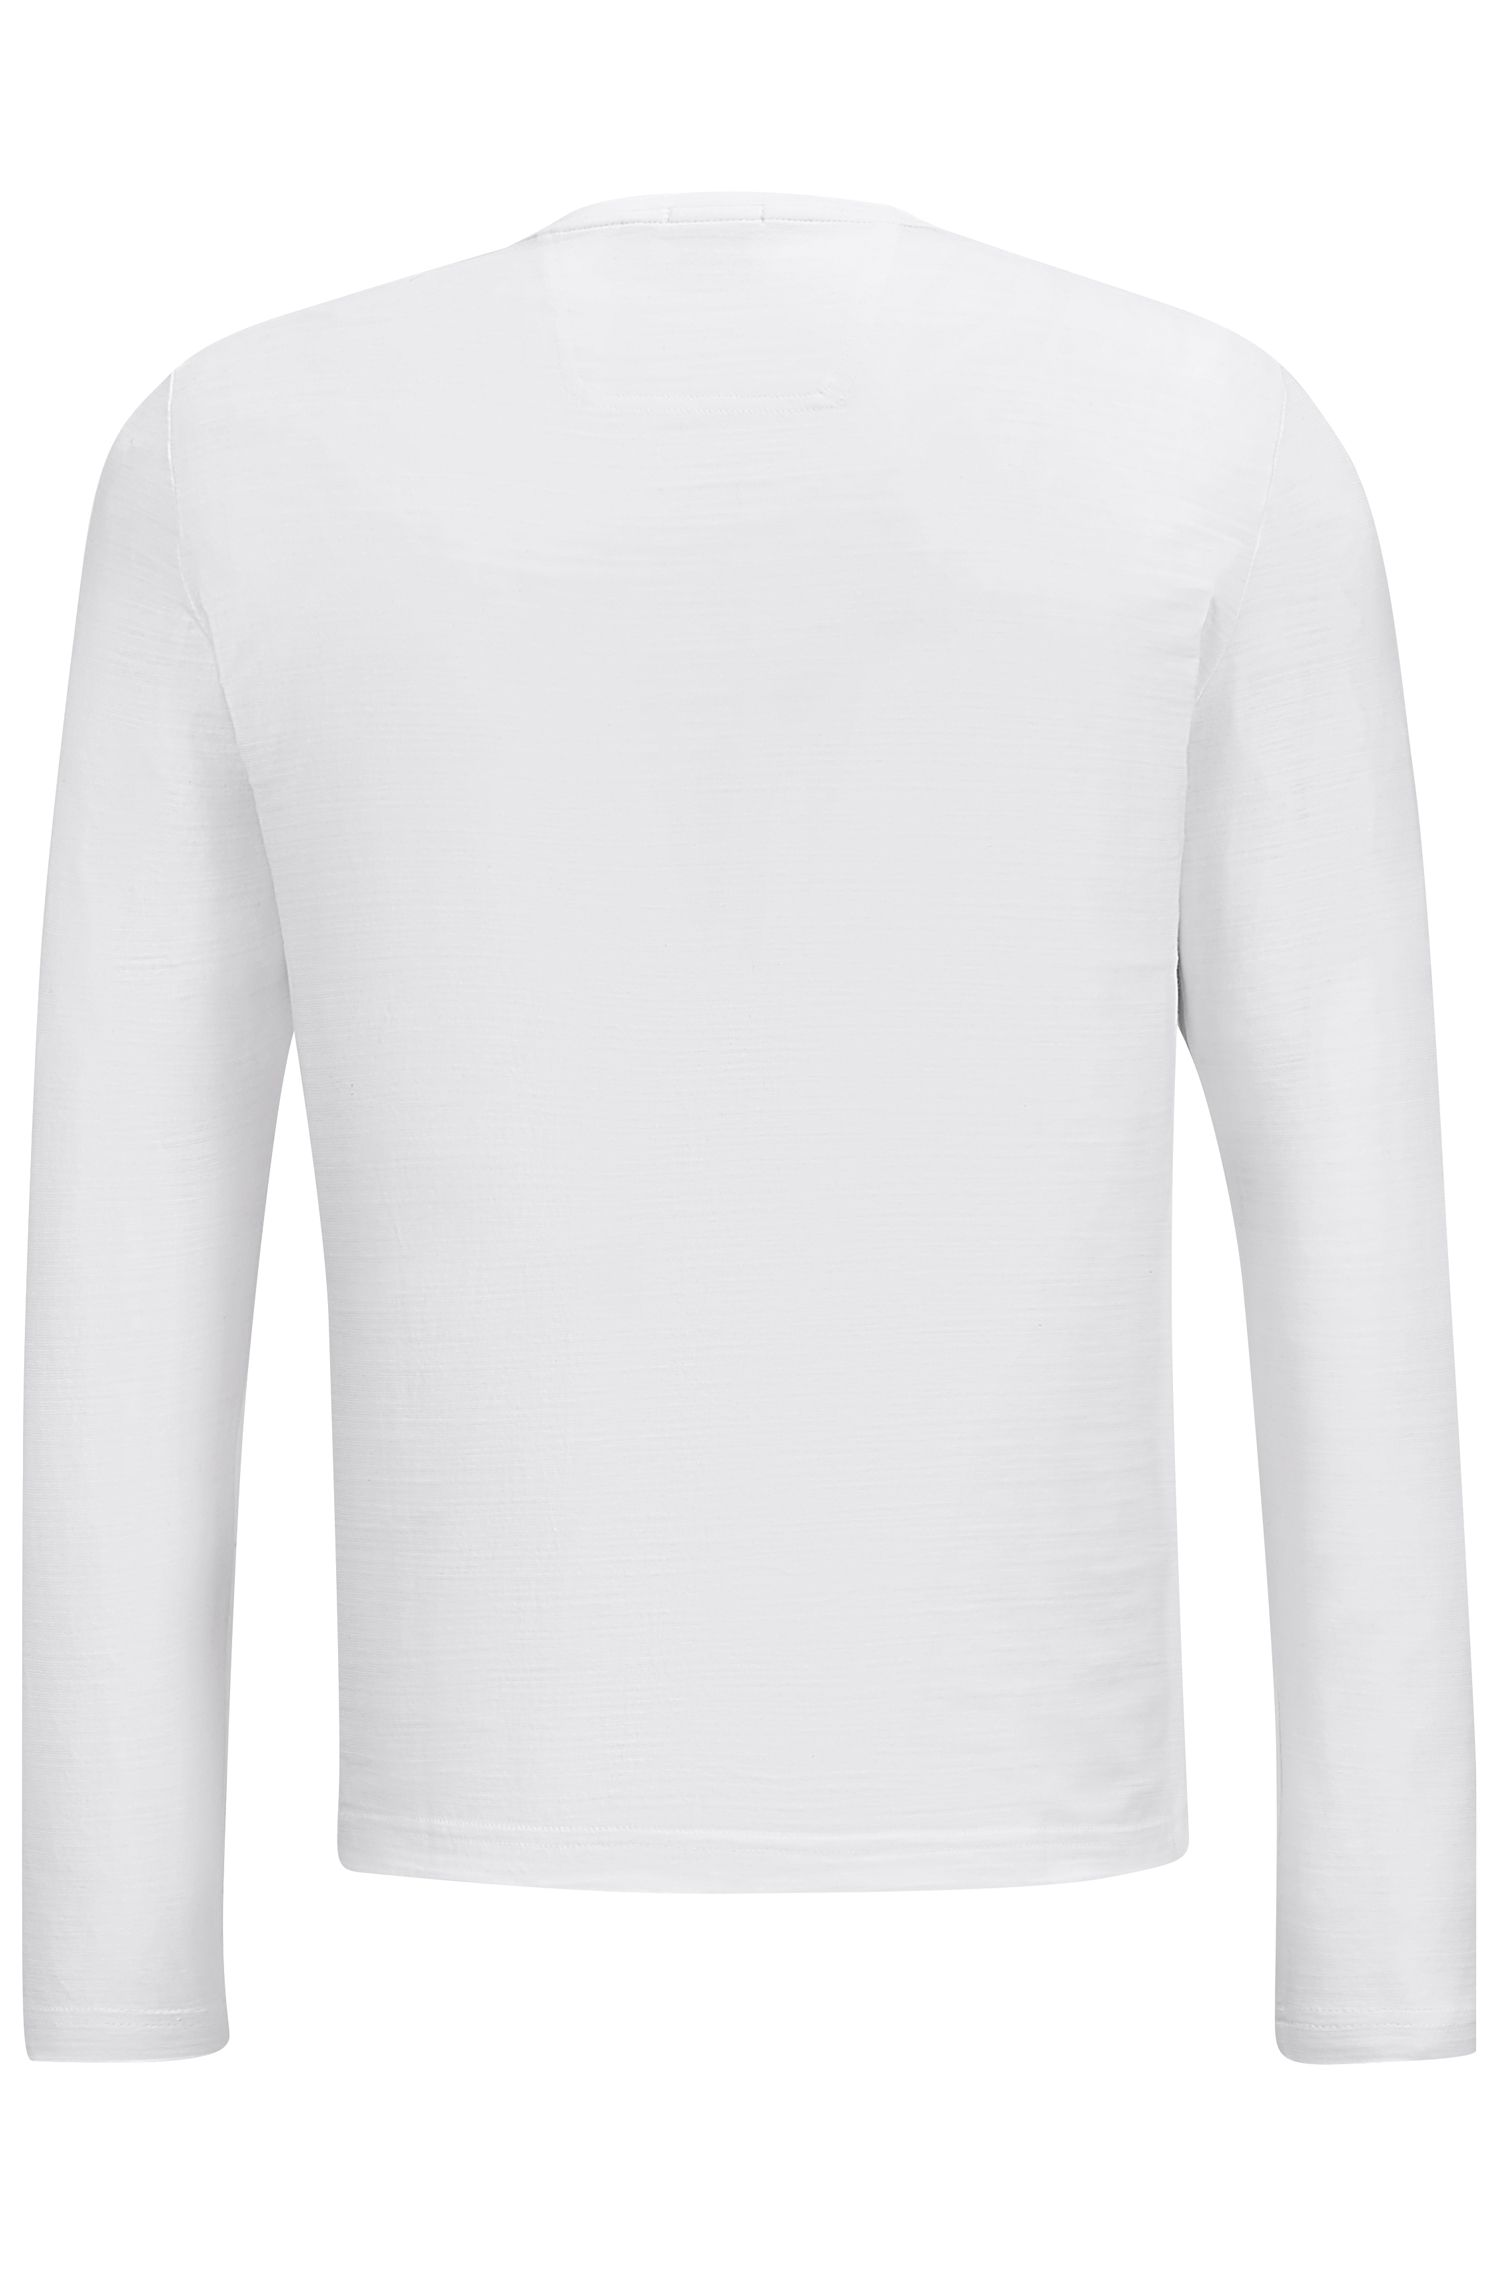 Cotton Sweater | Sessari US, White